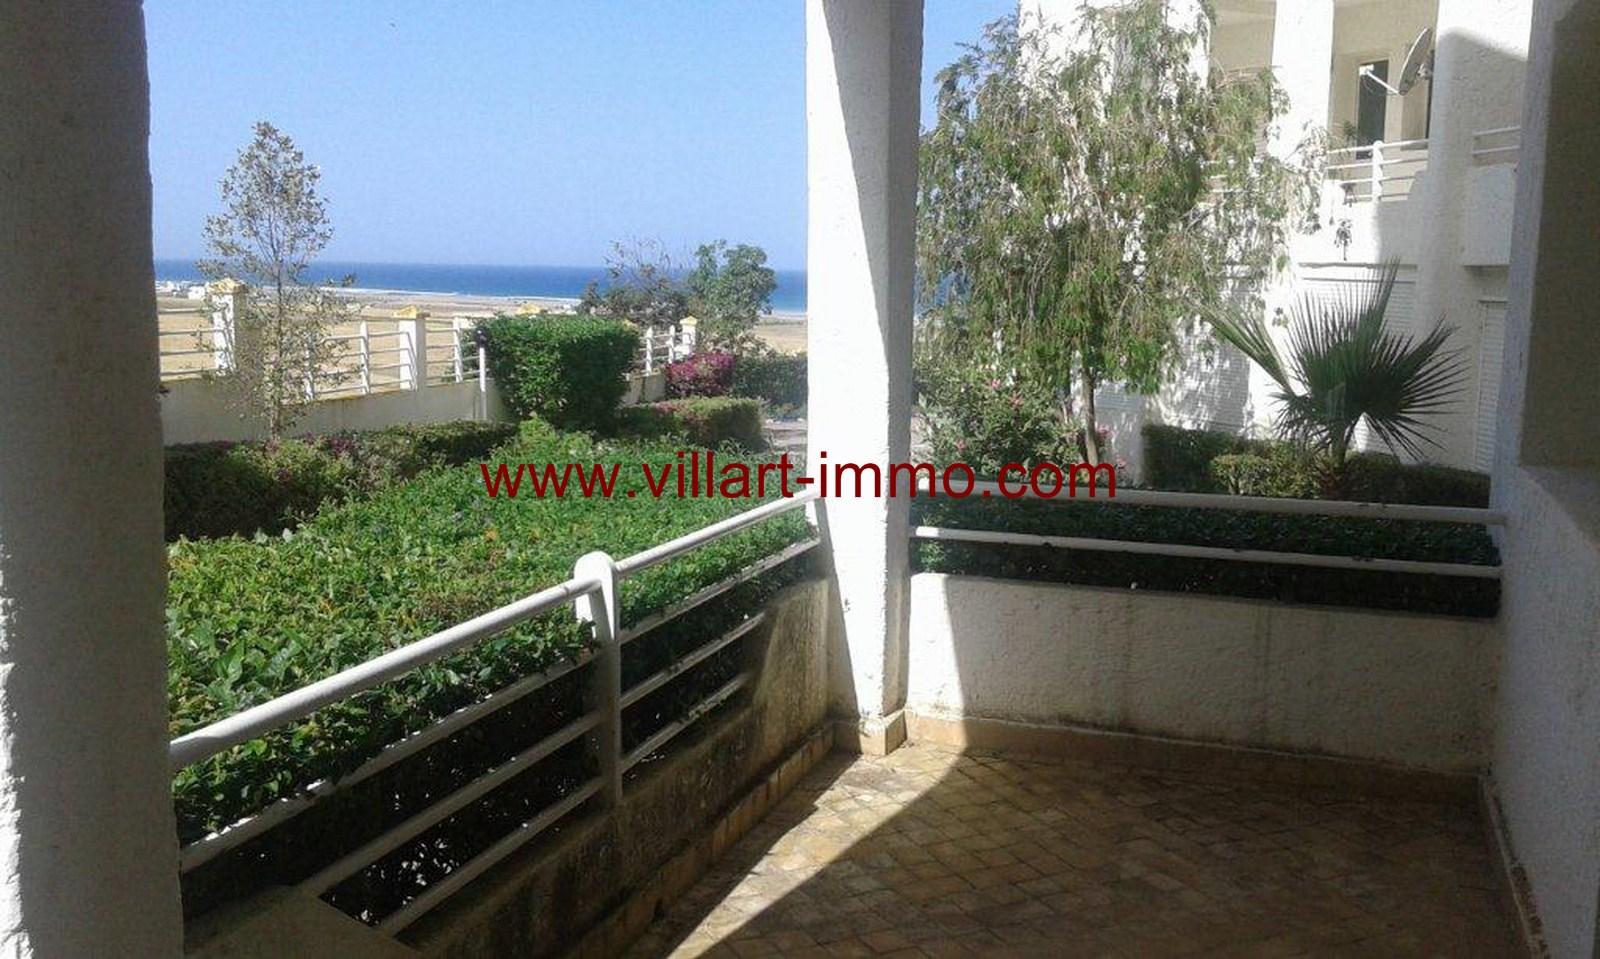 6-Vente-Appartement-Assilah-Terrasse -VA511-Villart Immo